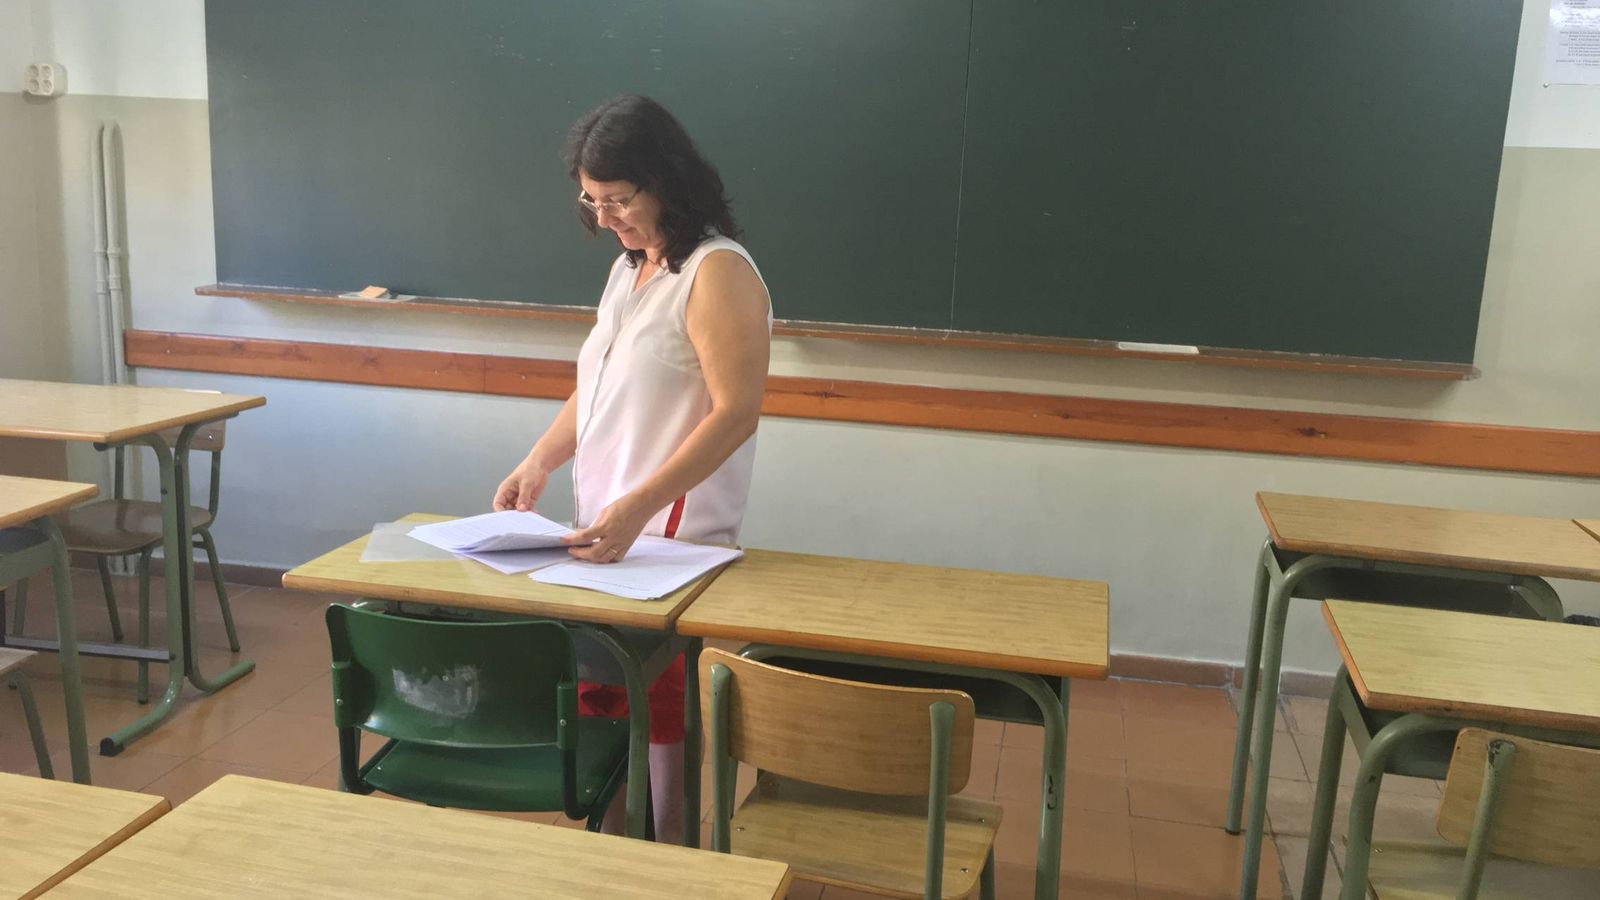 Foto: Gloria Eguaras, otro modelo de misionera. (Andreas Palaudarias)